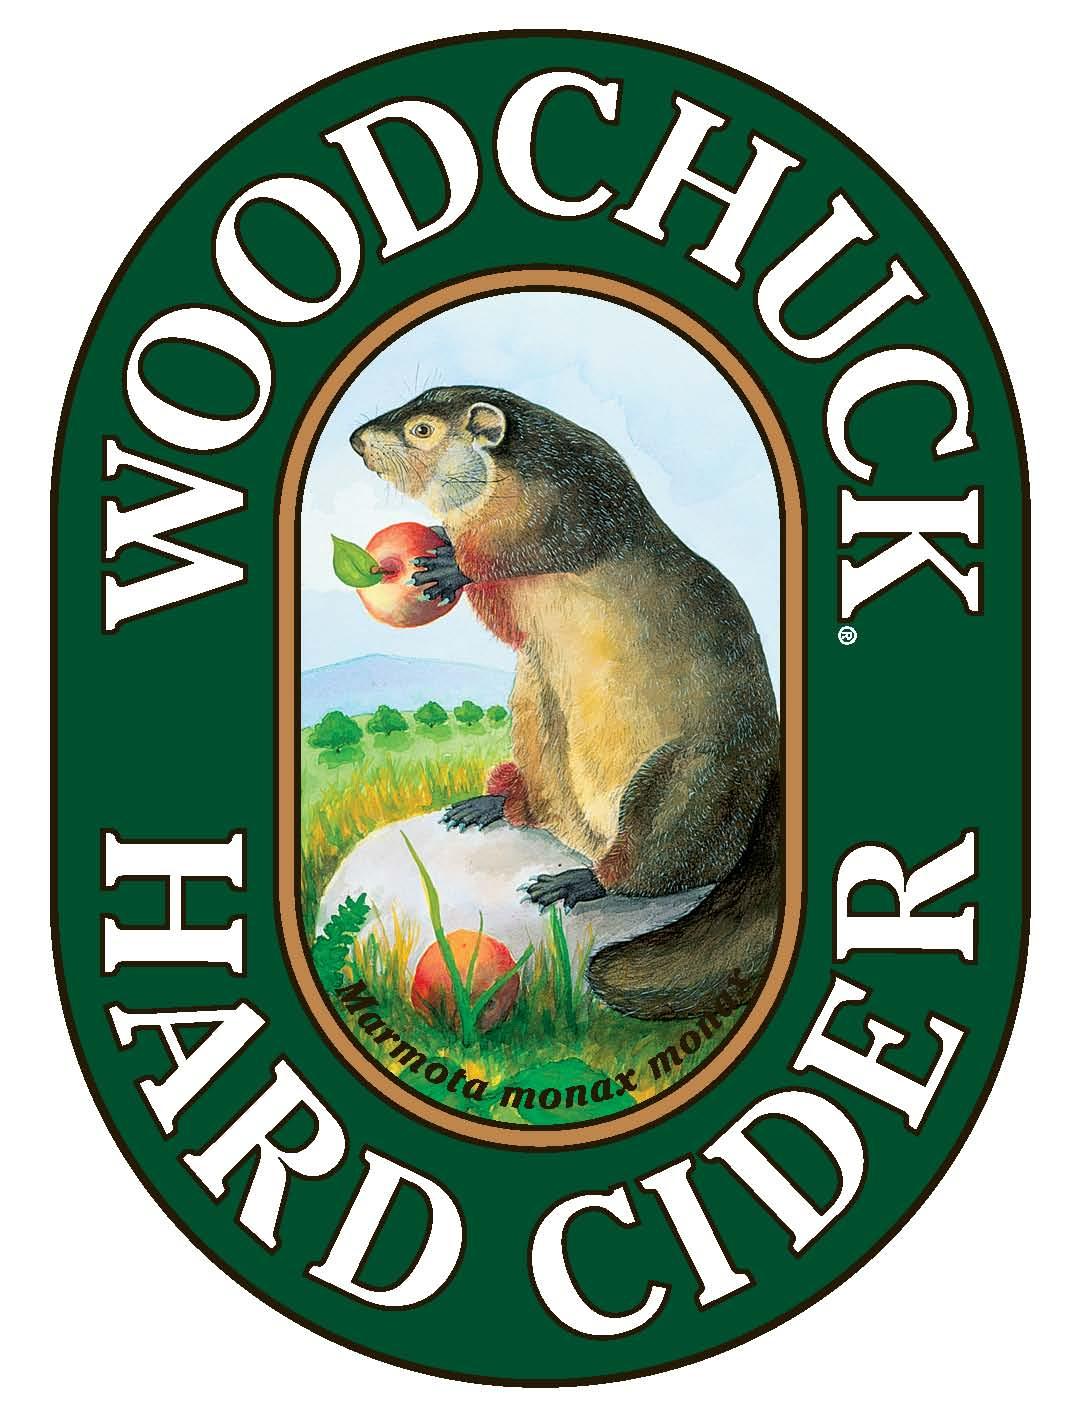 Woodchuck-Cider-Logo.jpg